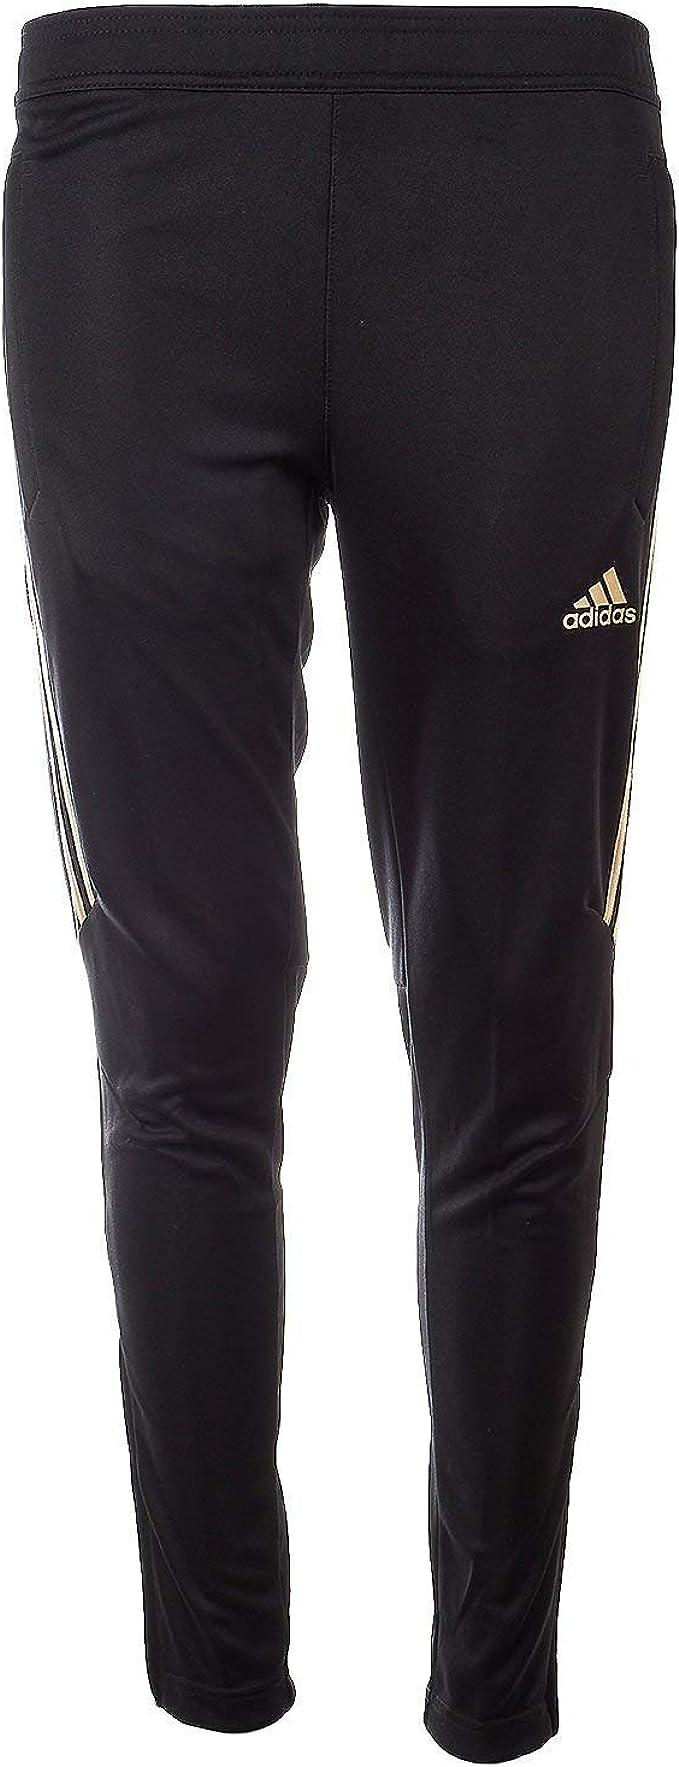 adidas gold pants